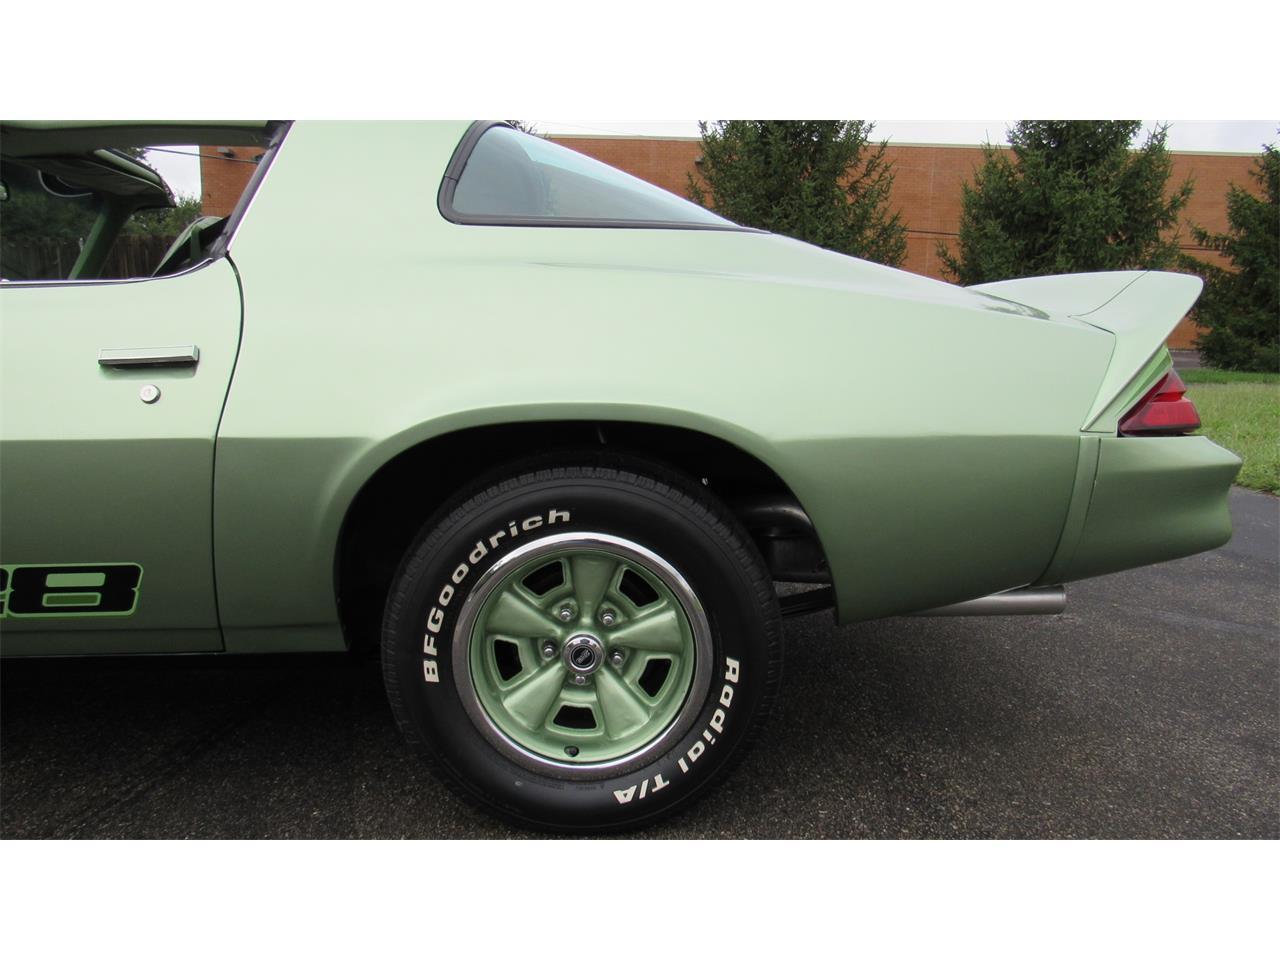 1979 Chevrolet Camaro Z28 (CC-1244755) for sale in Boise, Idaho